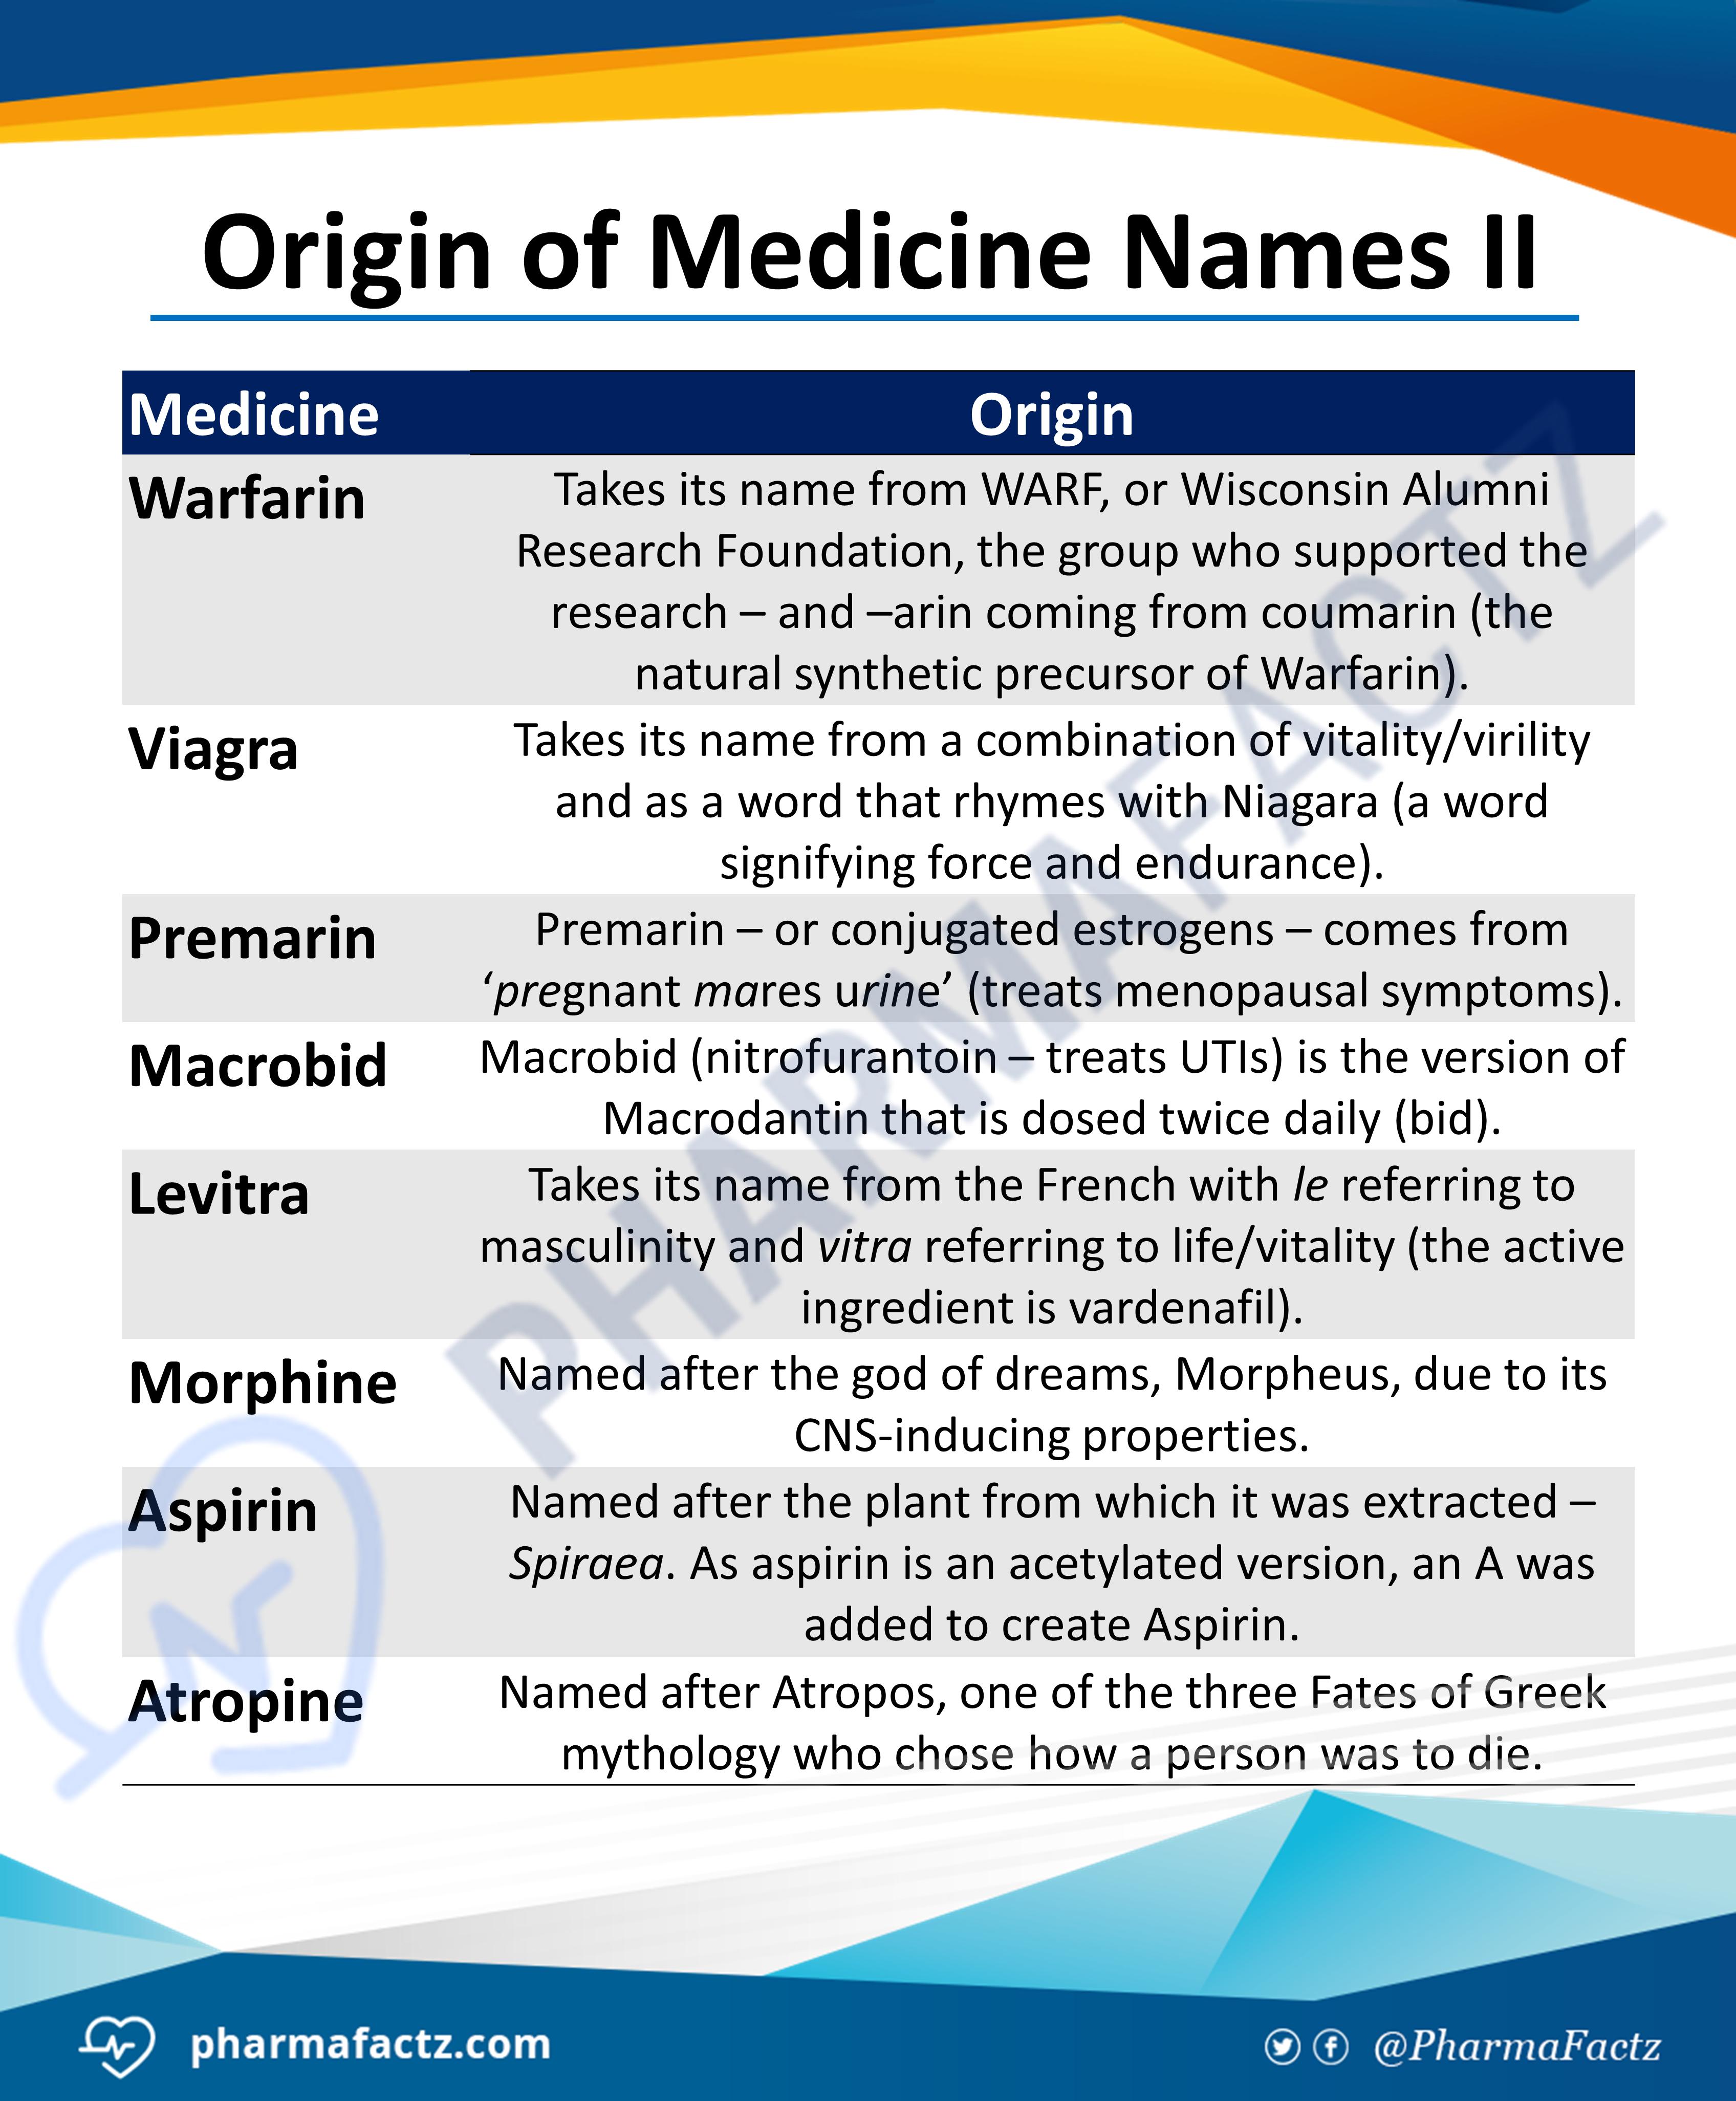 Origin of Medicine Names II